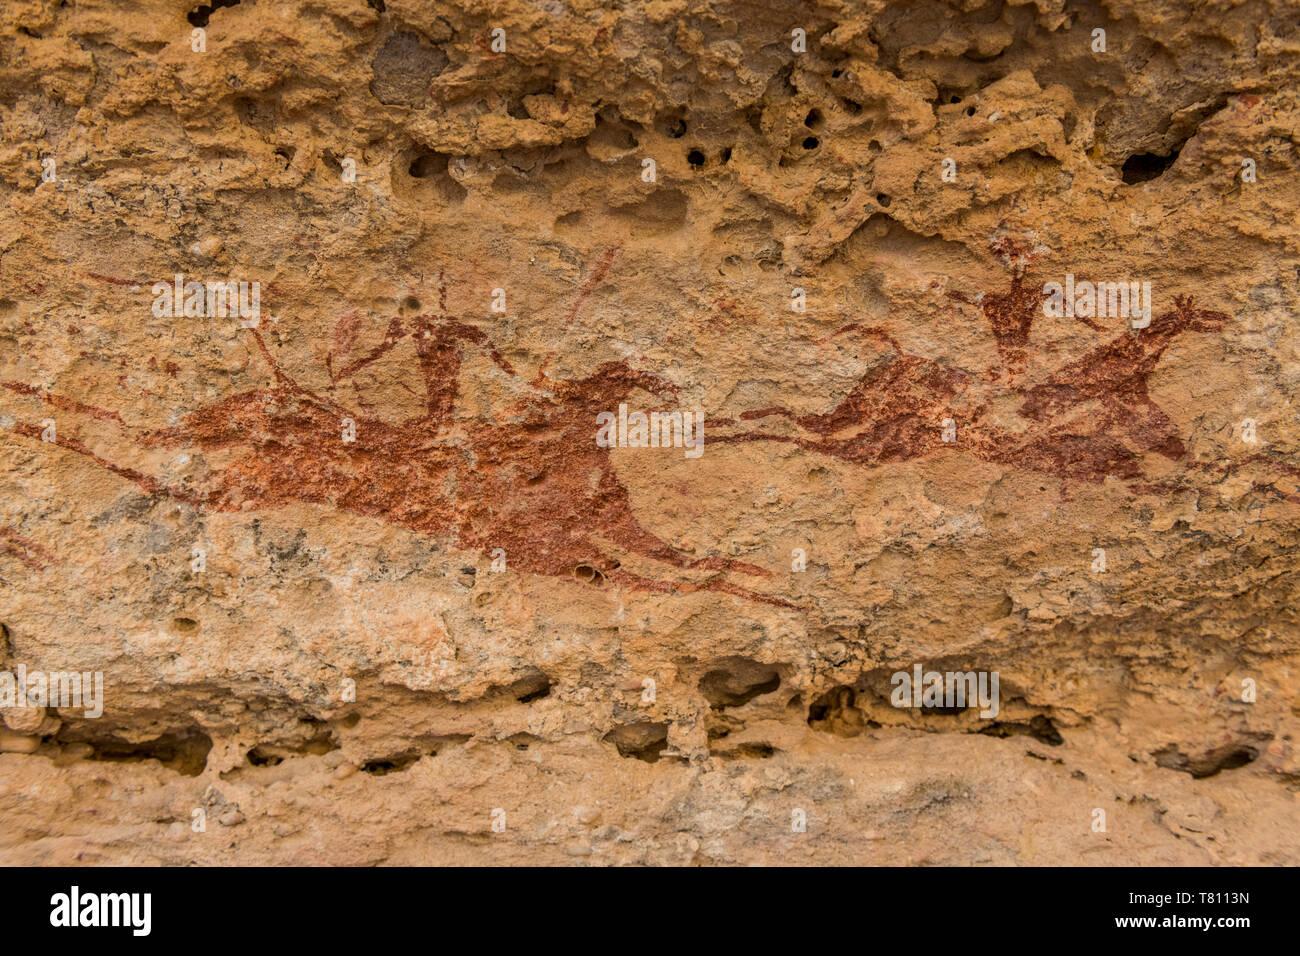 Pintura rupestre de Ennedi, meseta, Sitio del Patrimonio Mundial de la UNESCO, la región de Ennedi, Chad, África Foto de stock